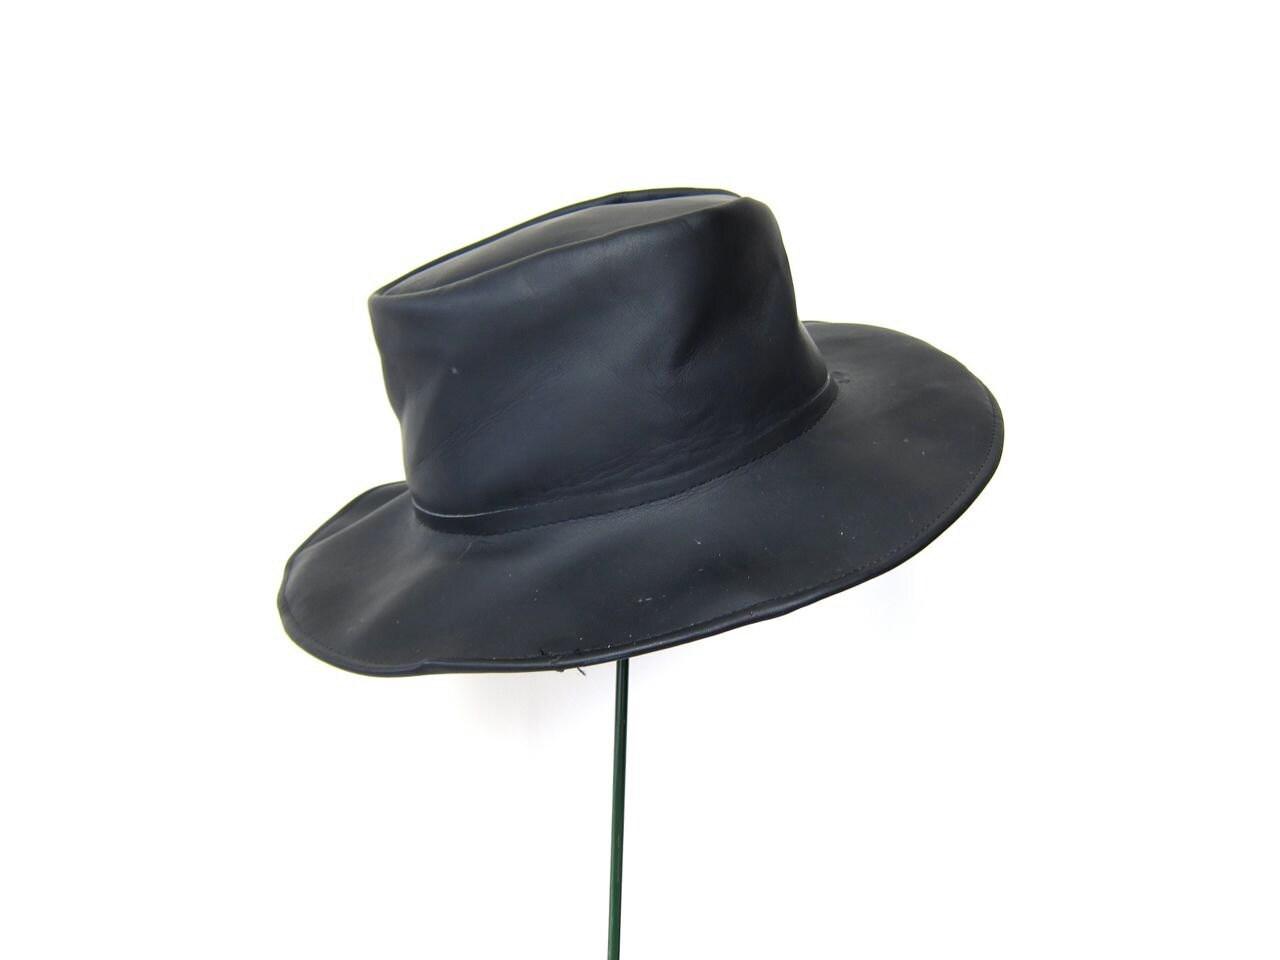 vintage black leather hat western indiana jones